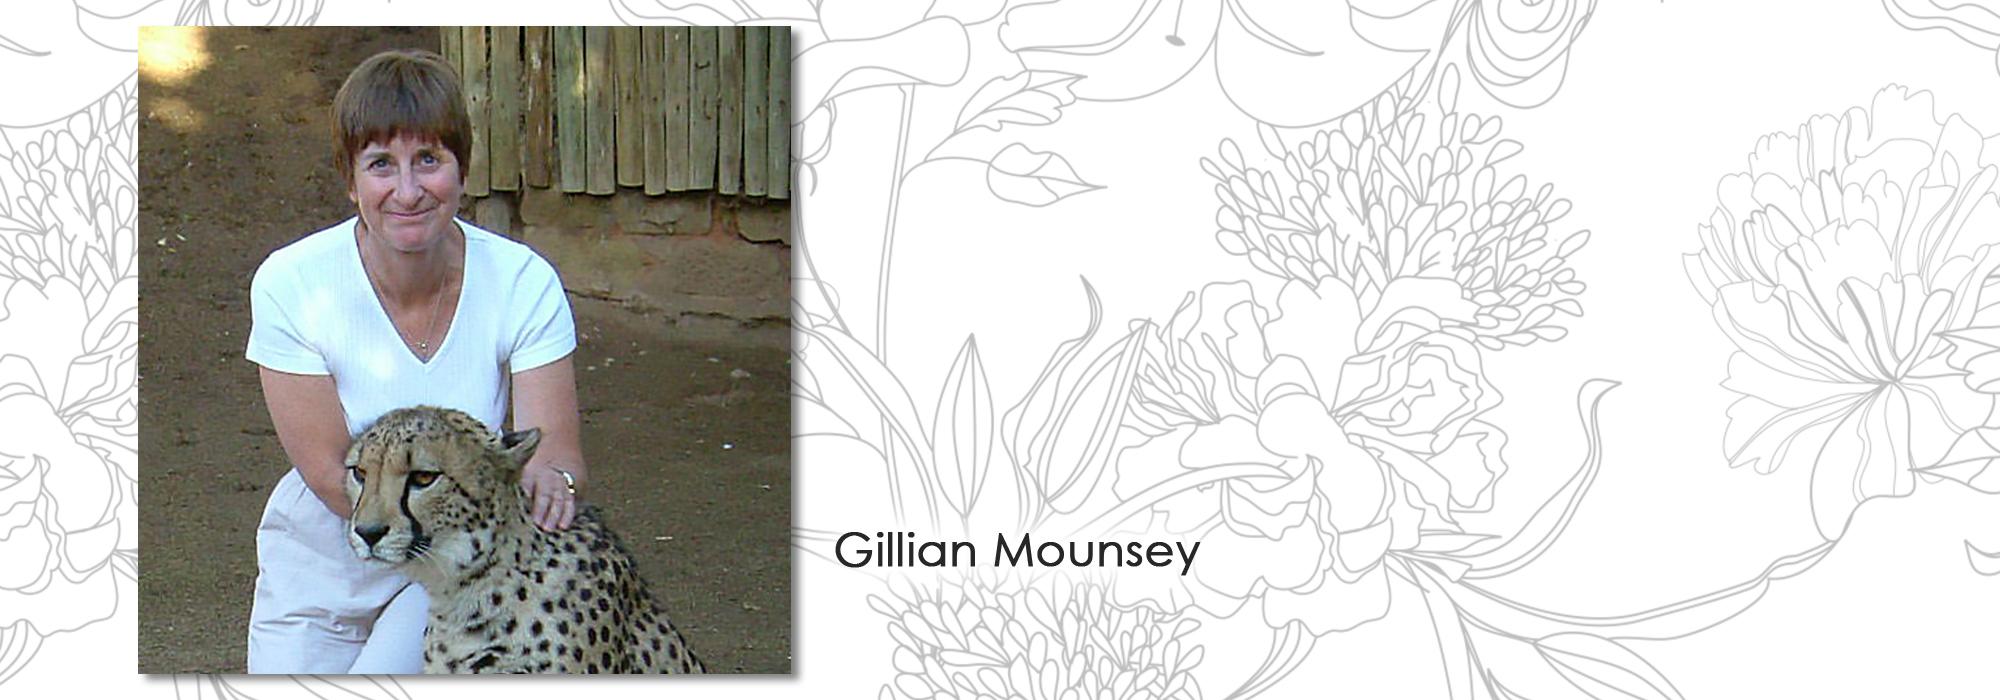 Gillian Mounsey